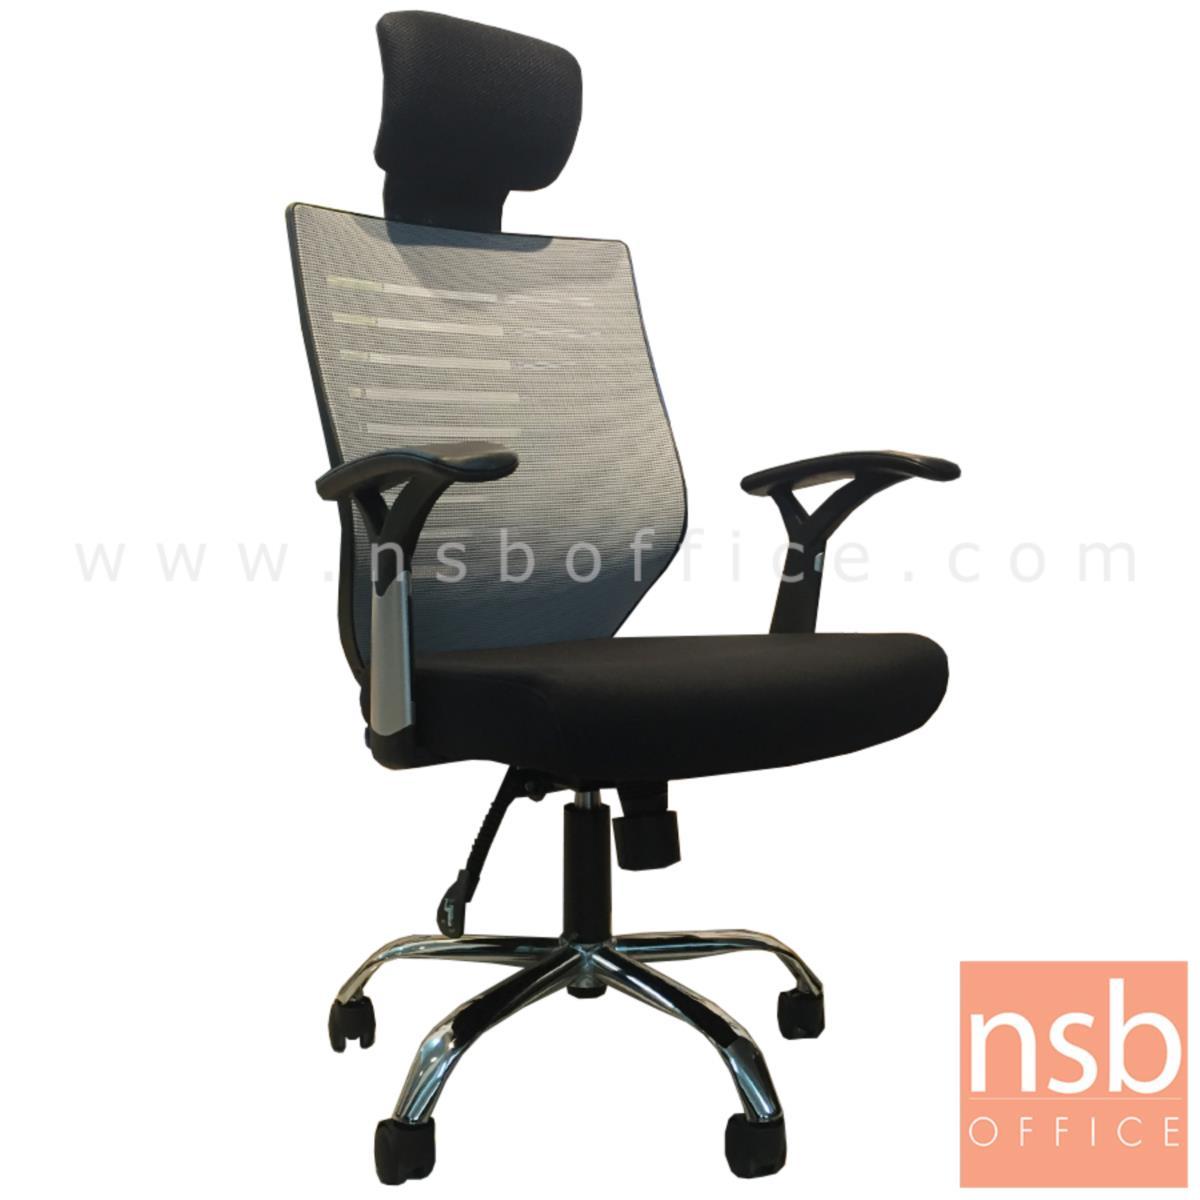 B24A196:เก้าอี้ผู้บริหารหลังเน็ต รุ่น Nightcrawlers (ไนท์คราวเลอรส์)  โช๊คแก๊ส มีก้อนโยก ขาเหล็กชุบโครเมี่ยม